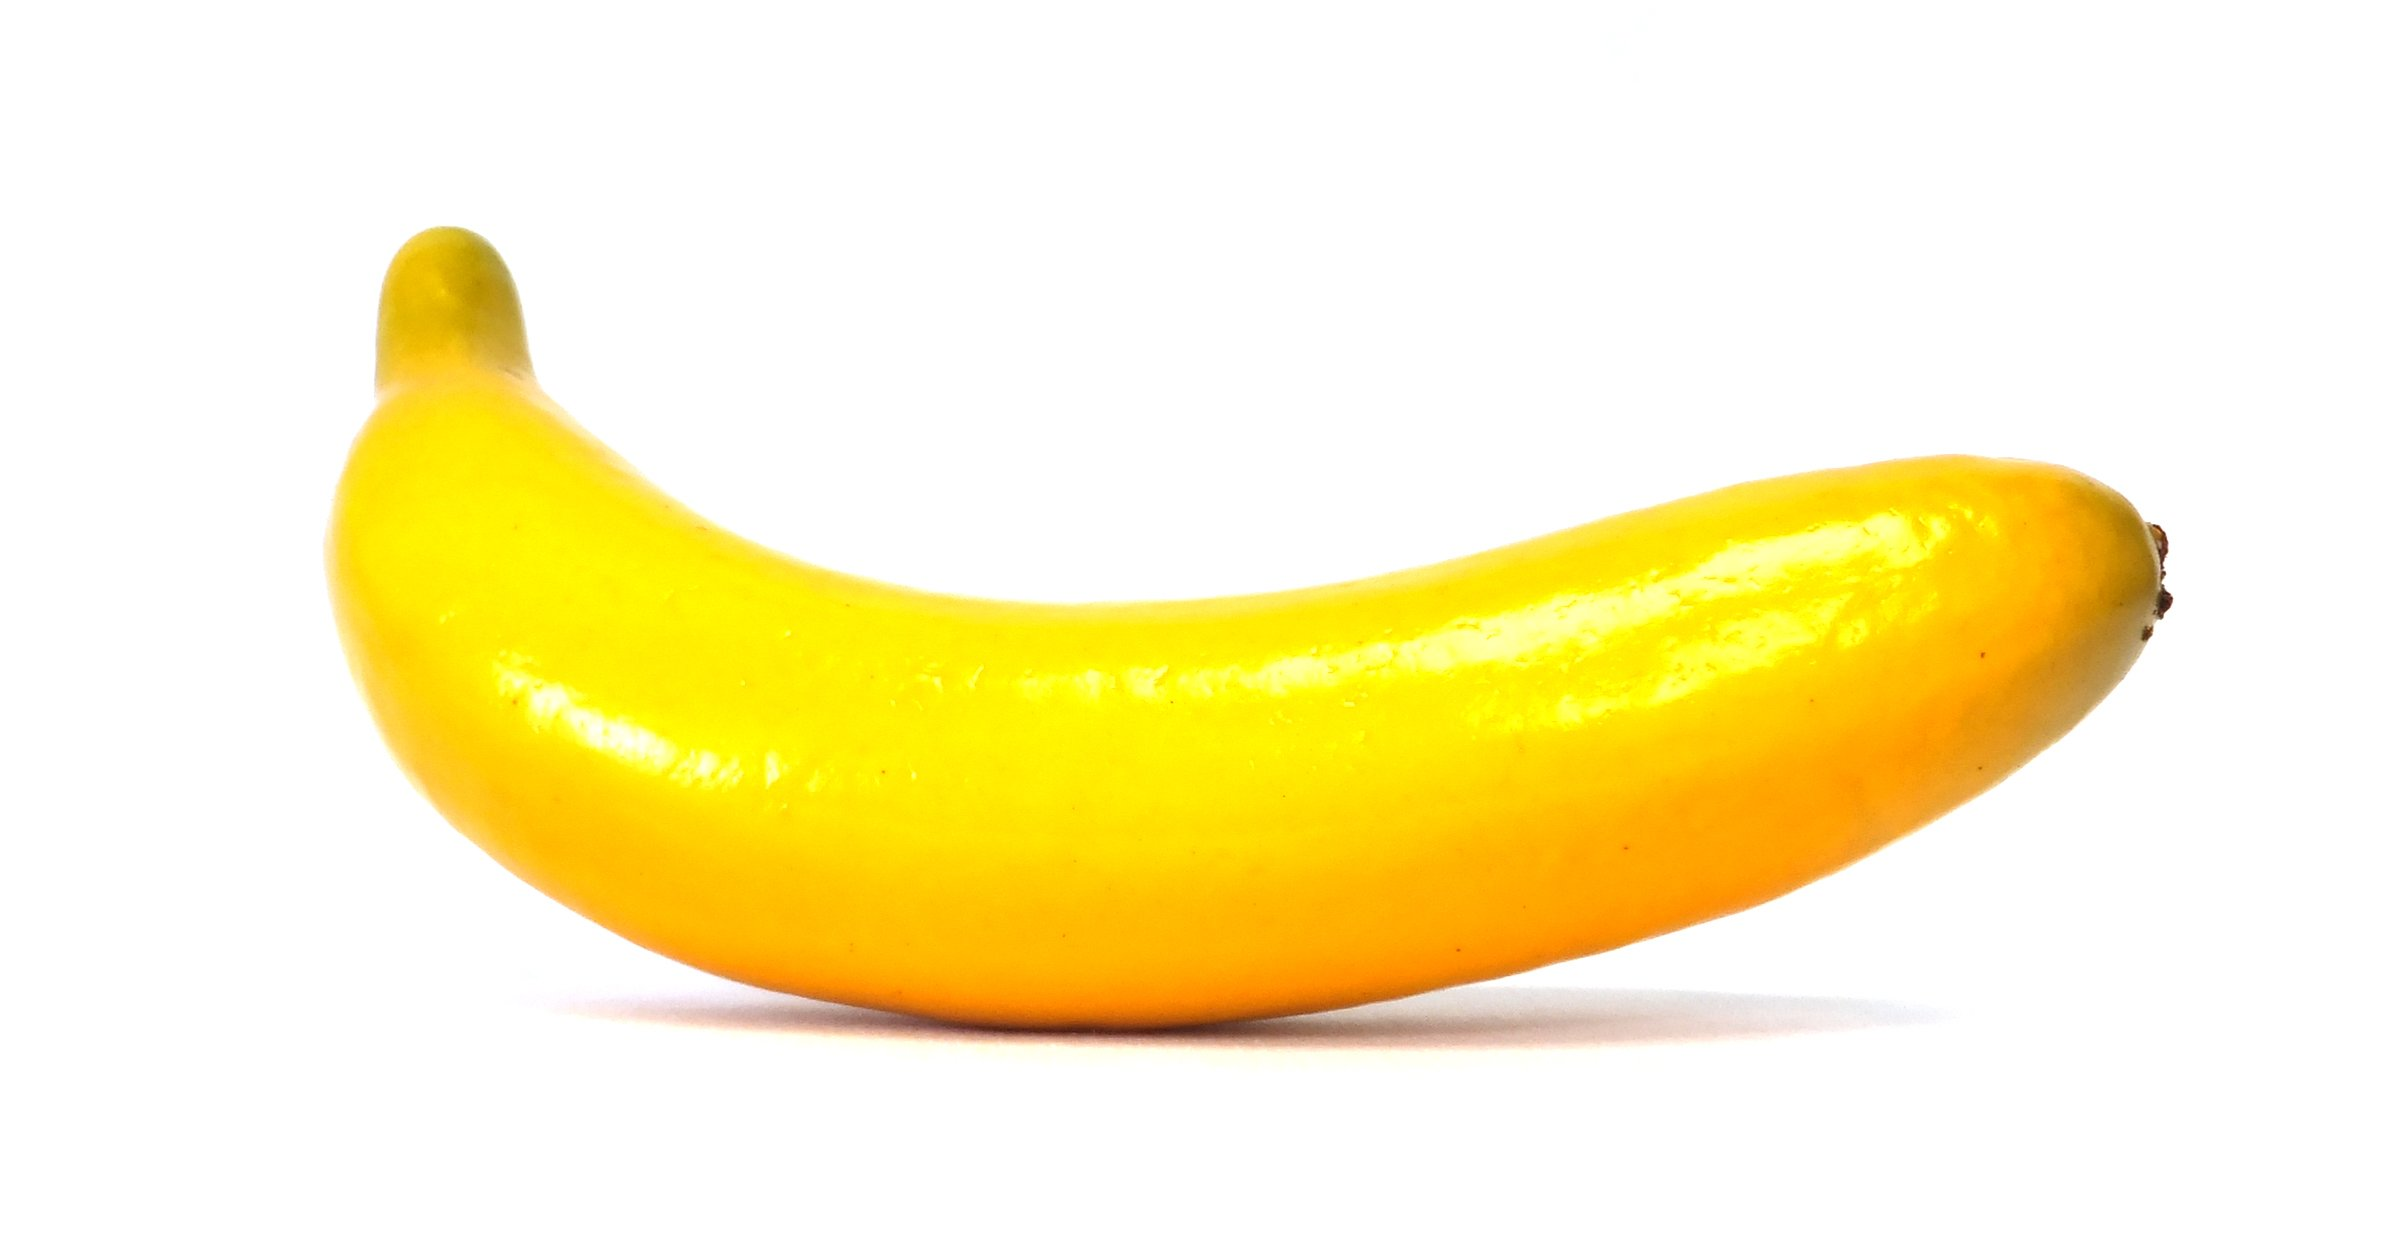 6pc-Artificial-Banana-Bananas-Plastic-Yellow-Decorative-Fruit-Six-Pieces